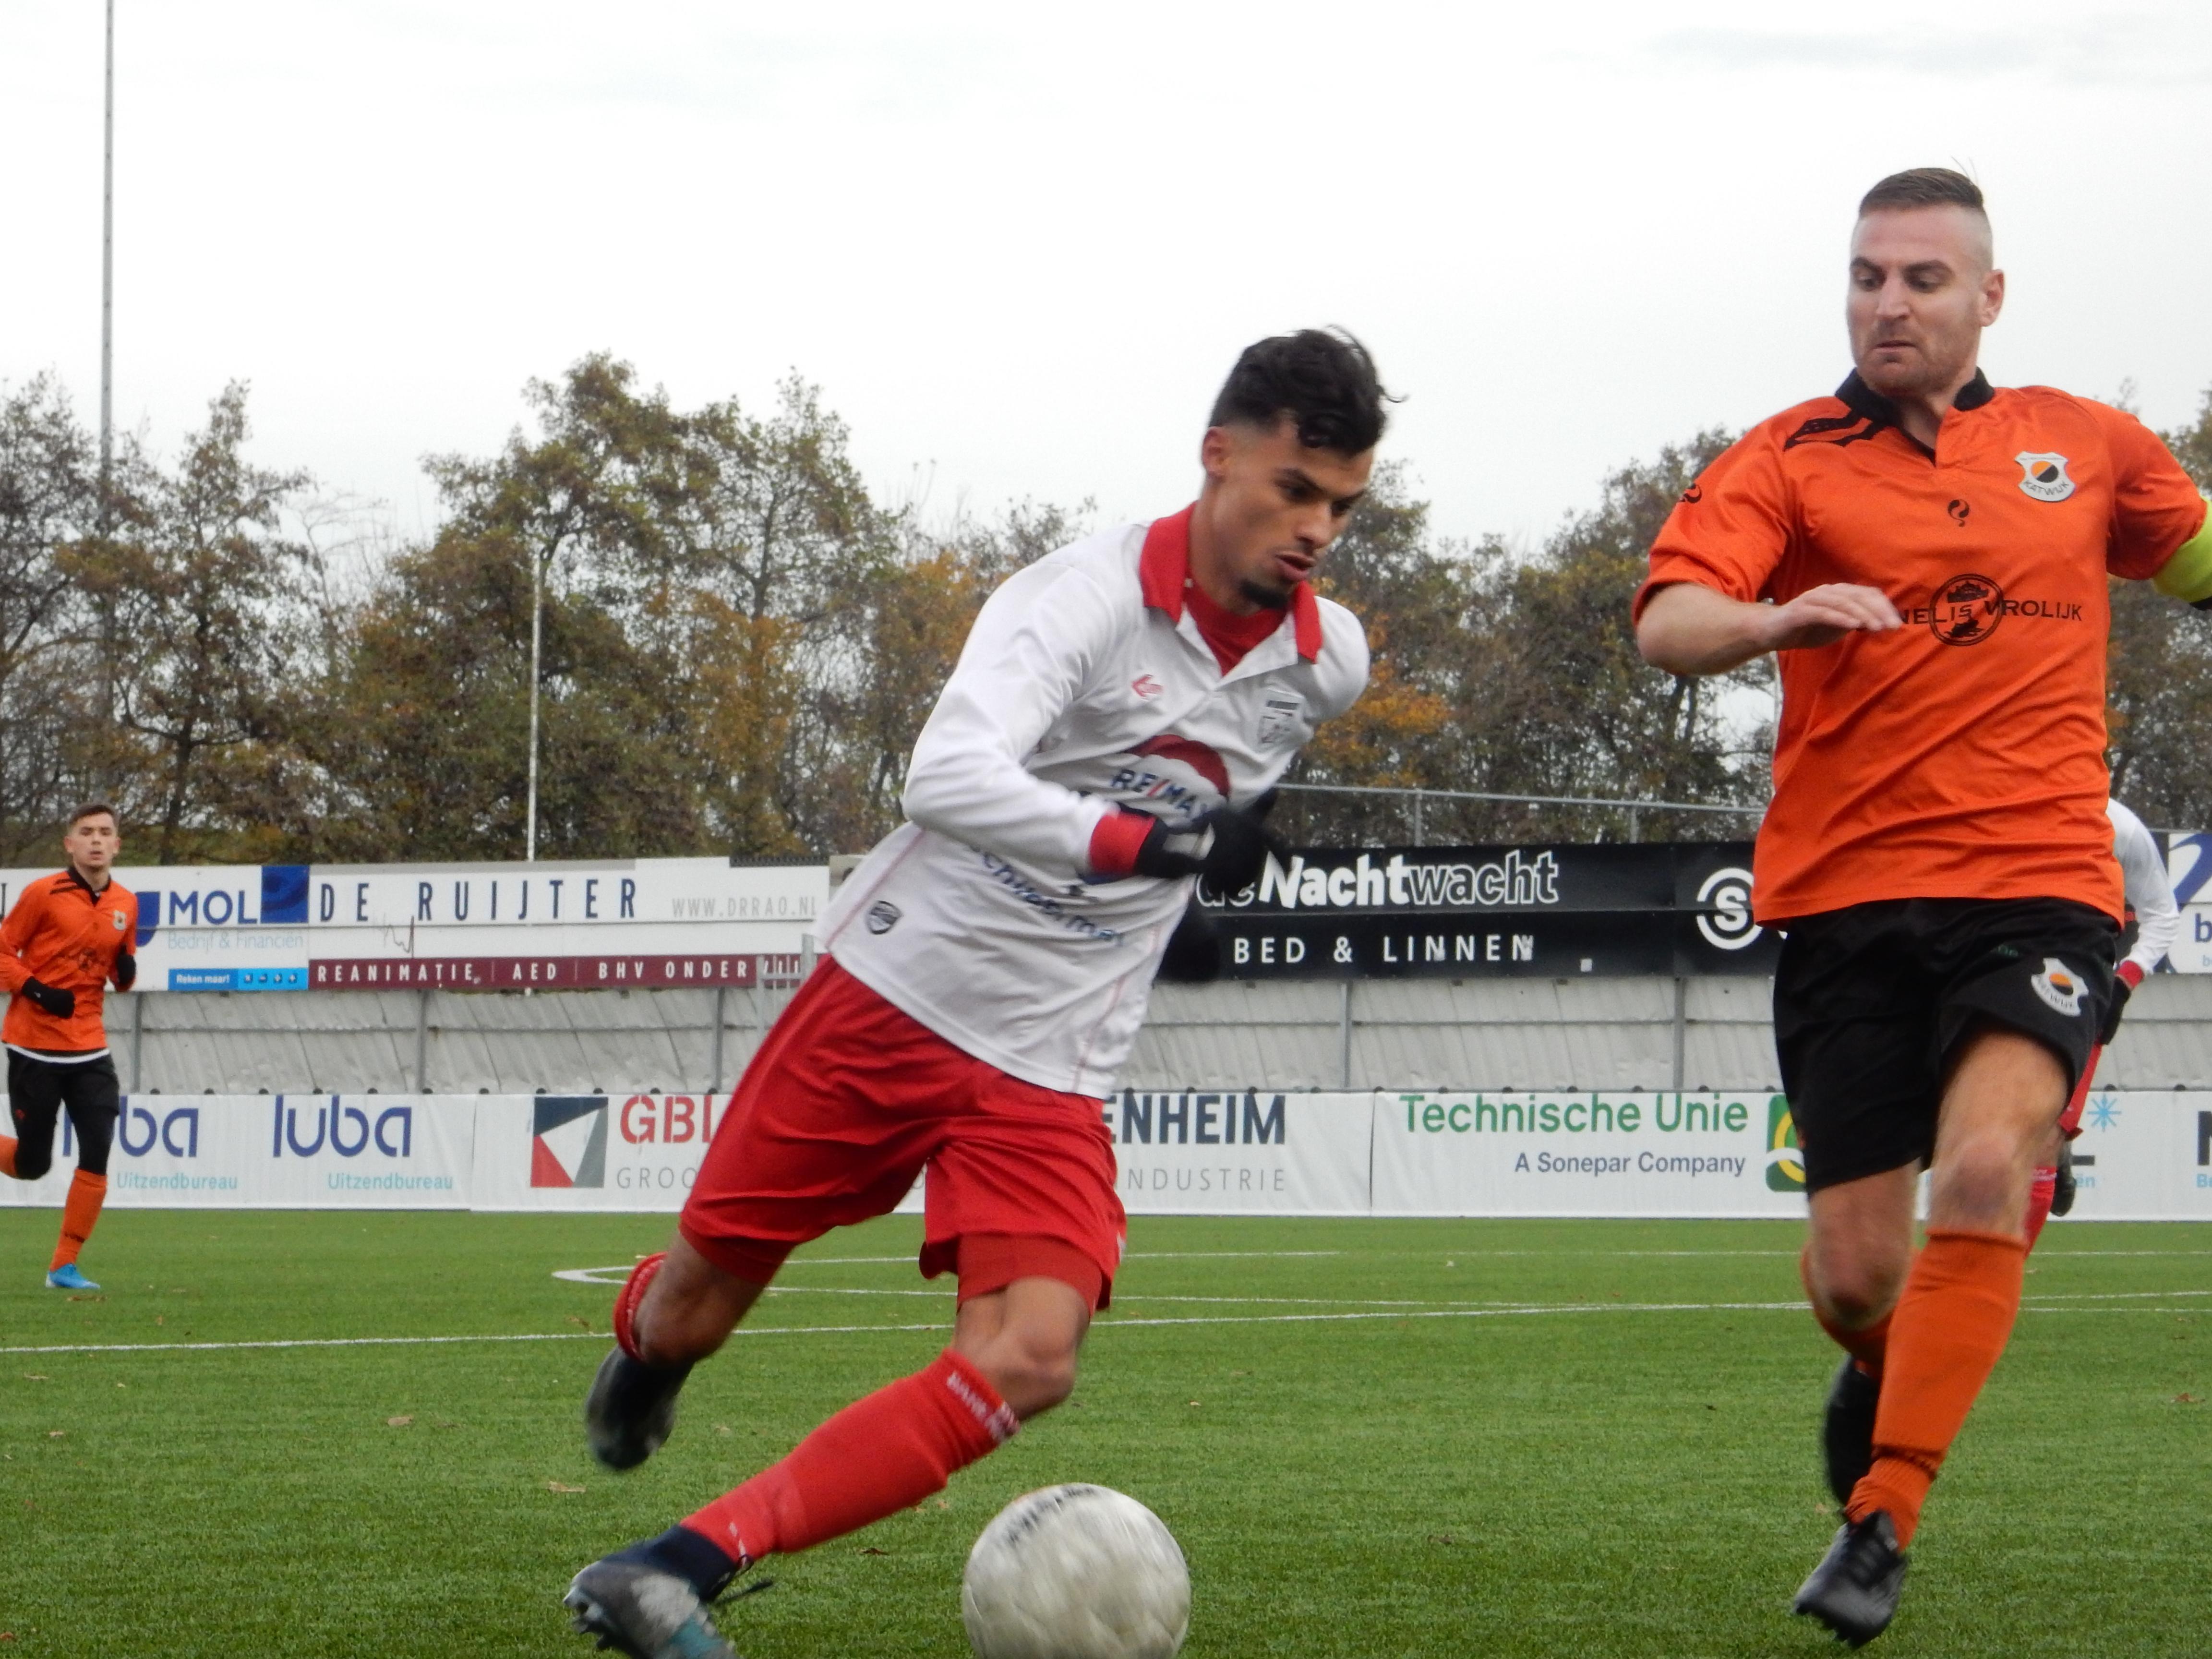 BVV 2 - Katwijk 2